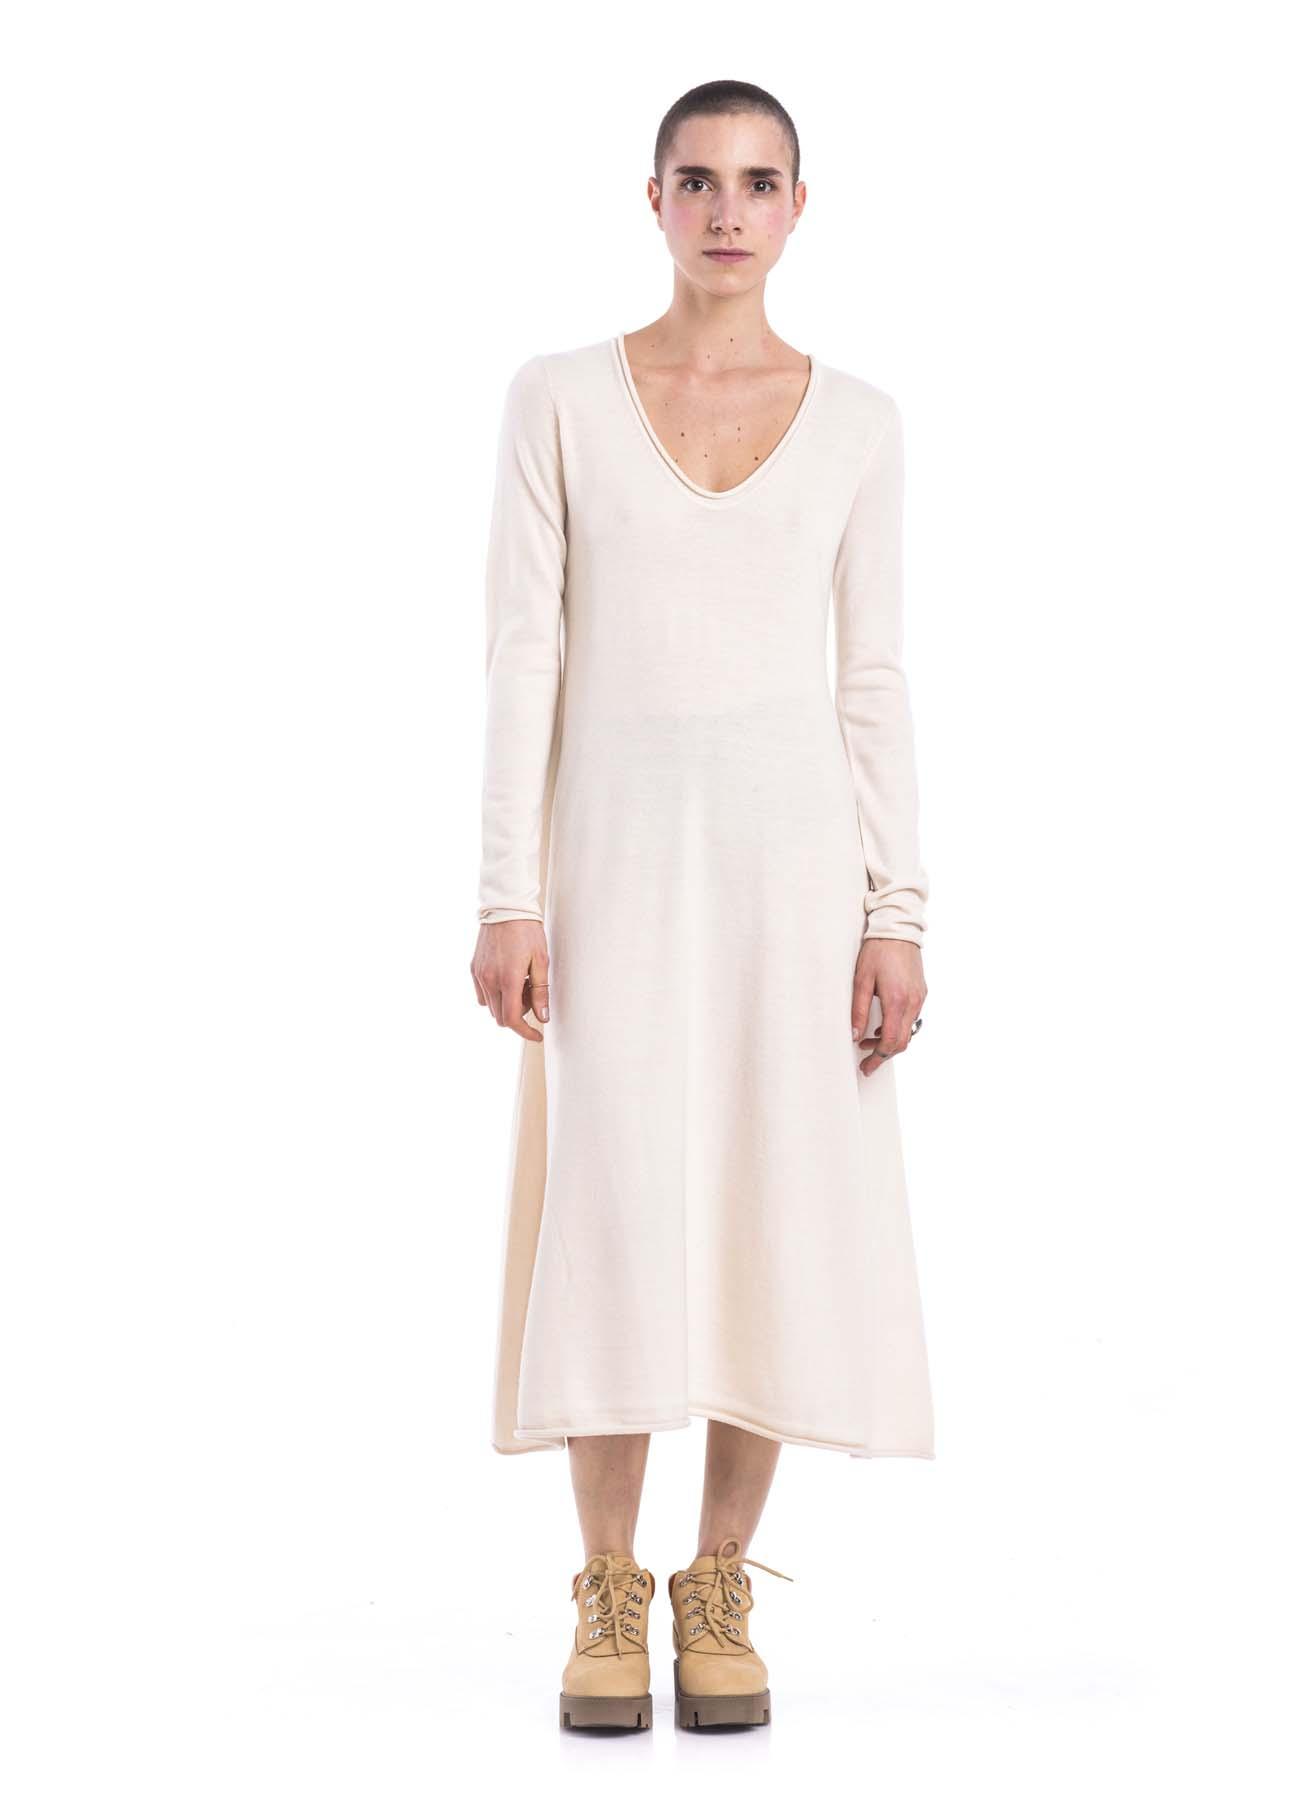 WHITE SUPERFINE MERINO DRESS